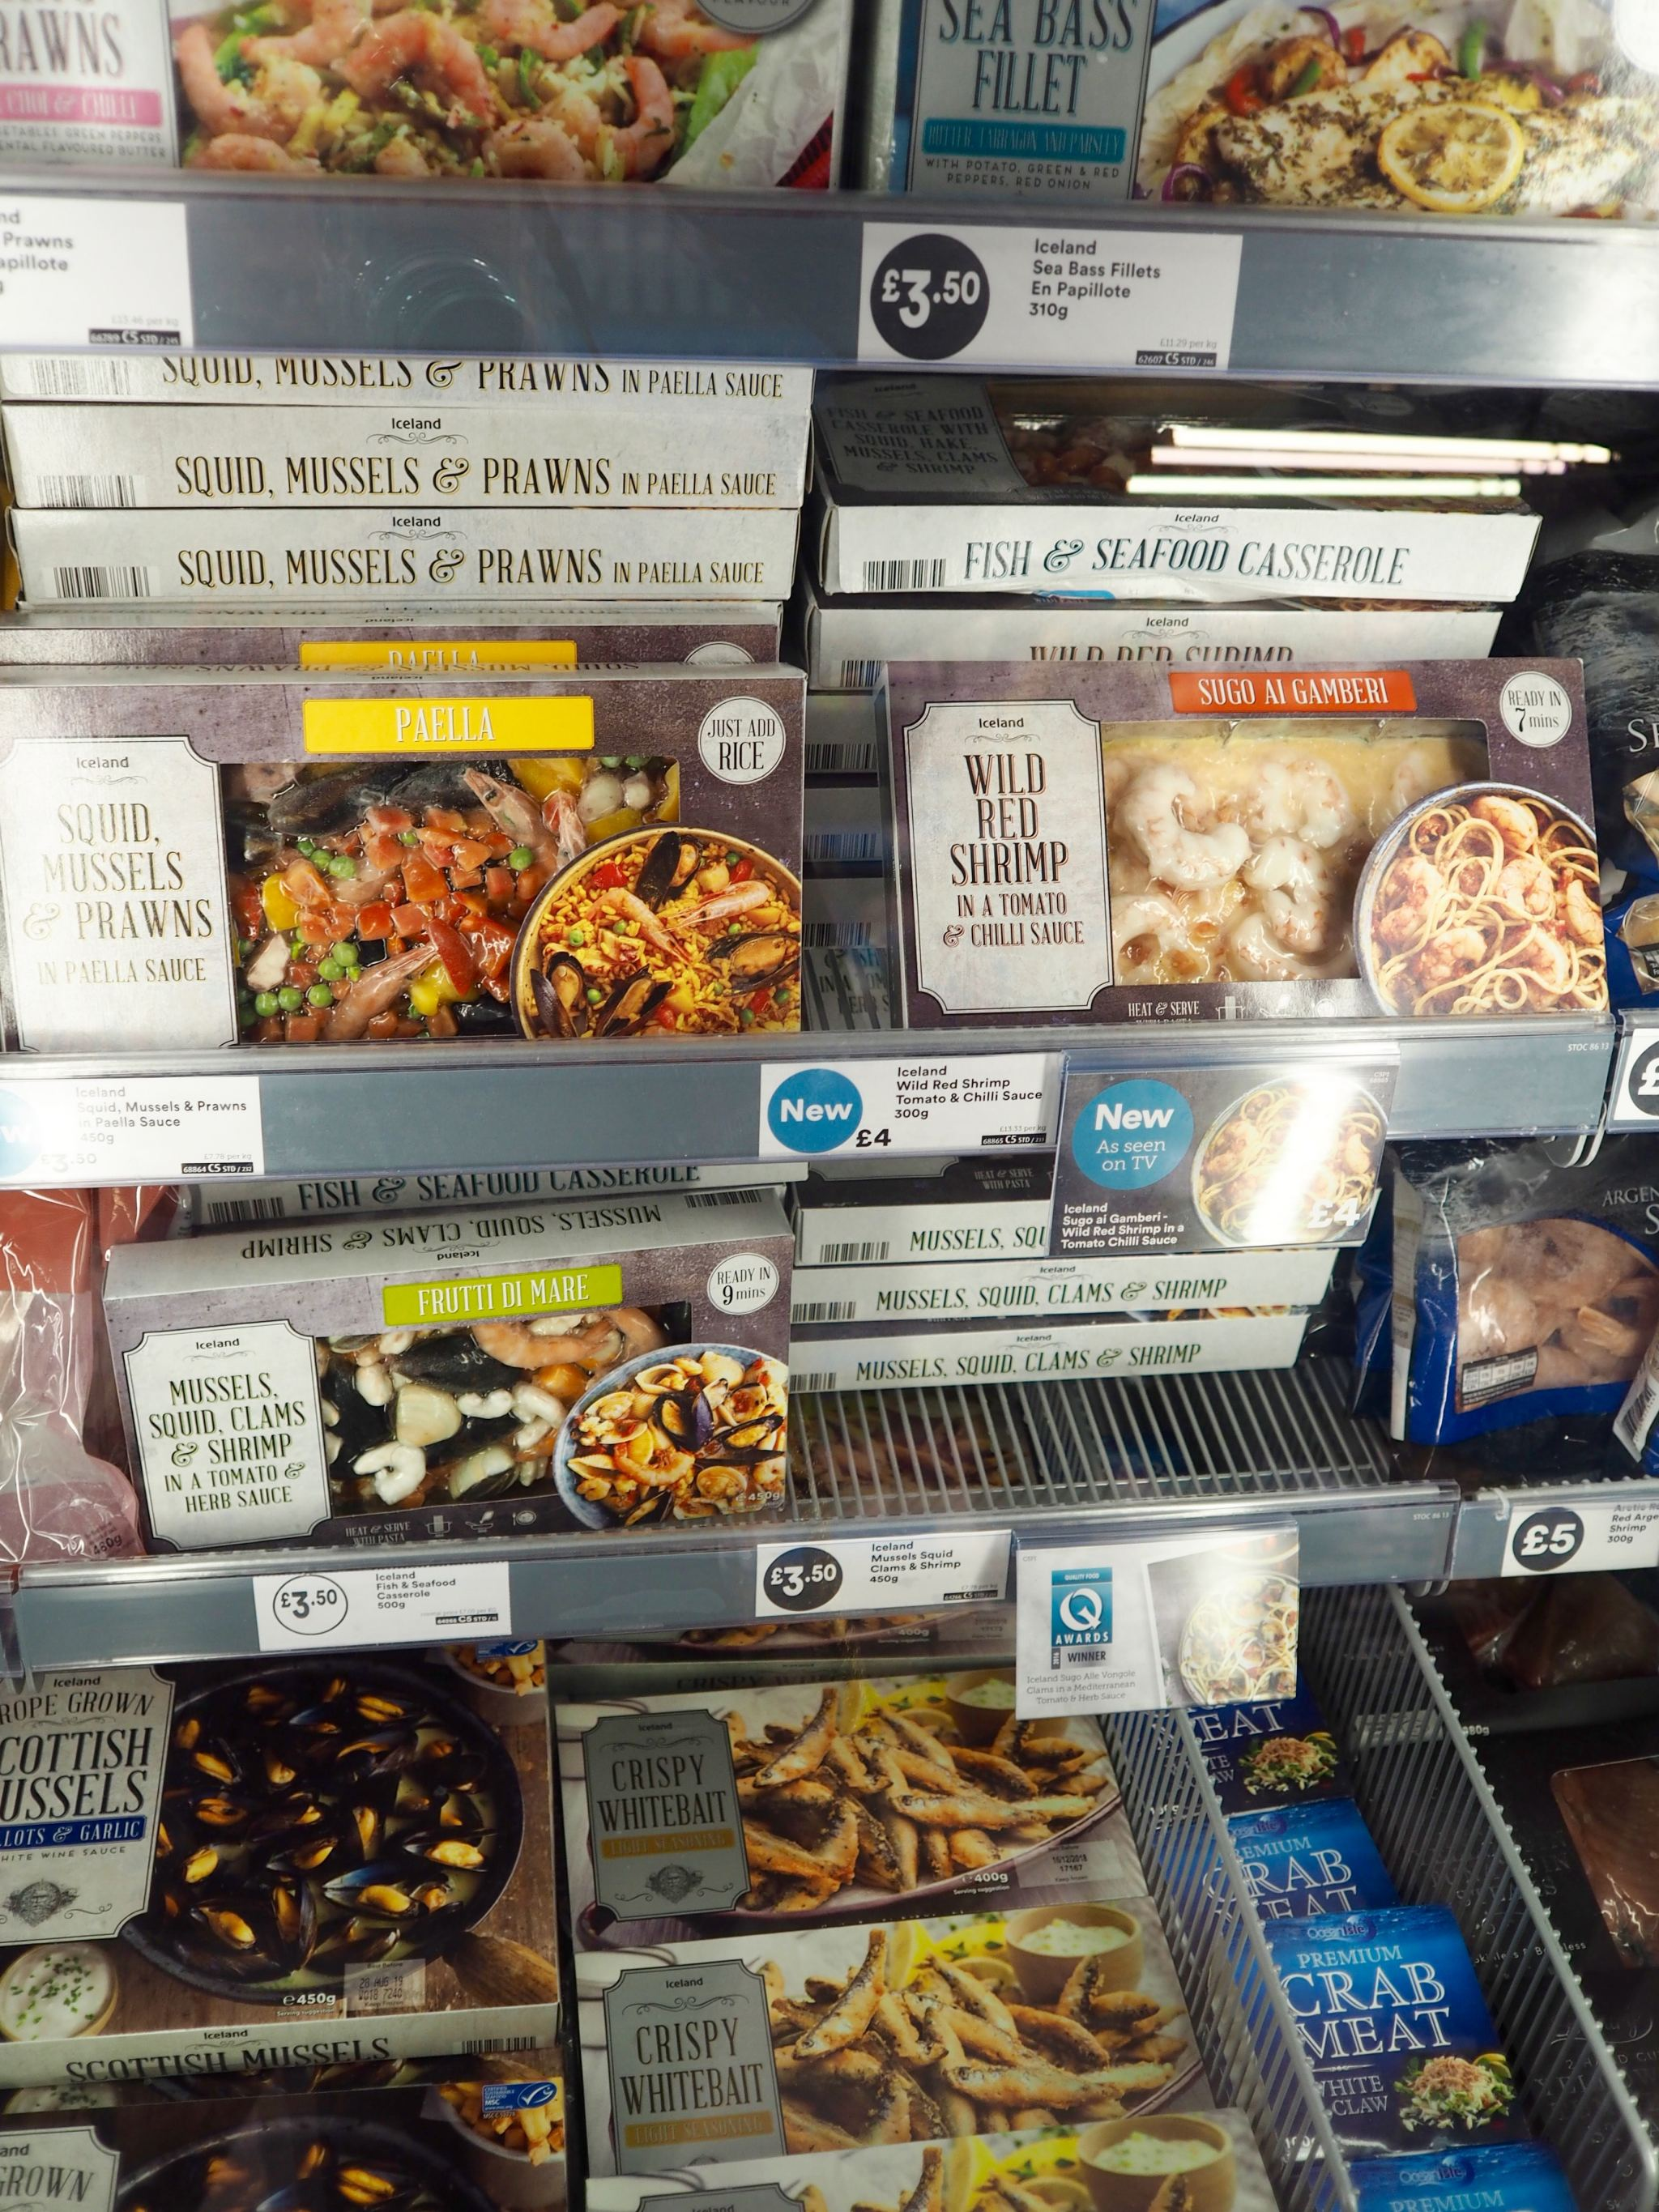 Cocoa Chelsea Iceland School of fish frozen food pasta